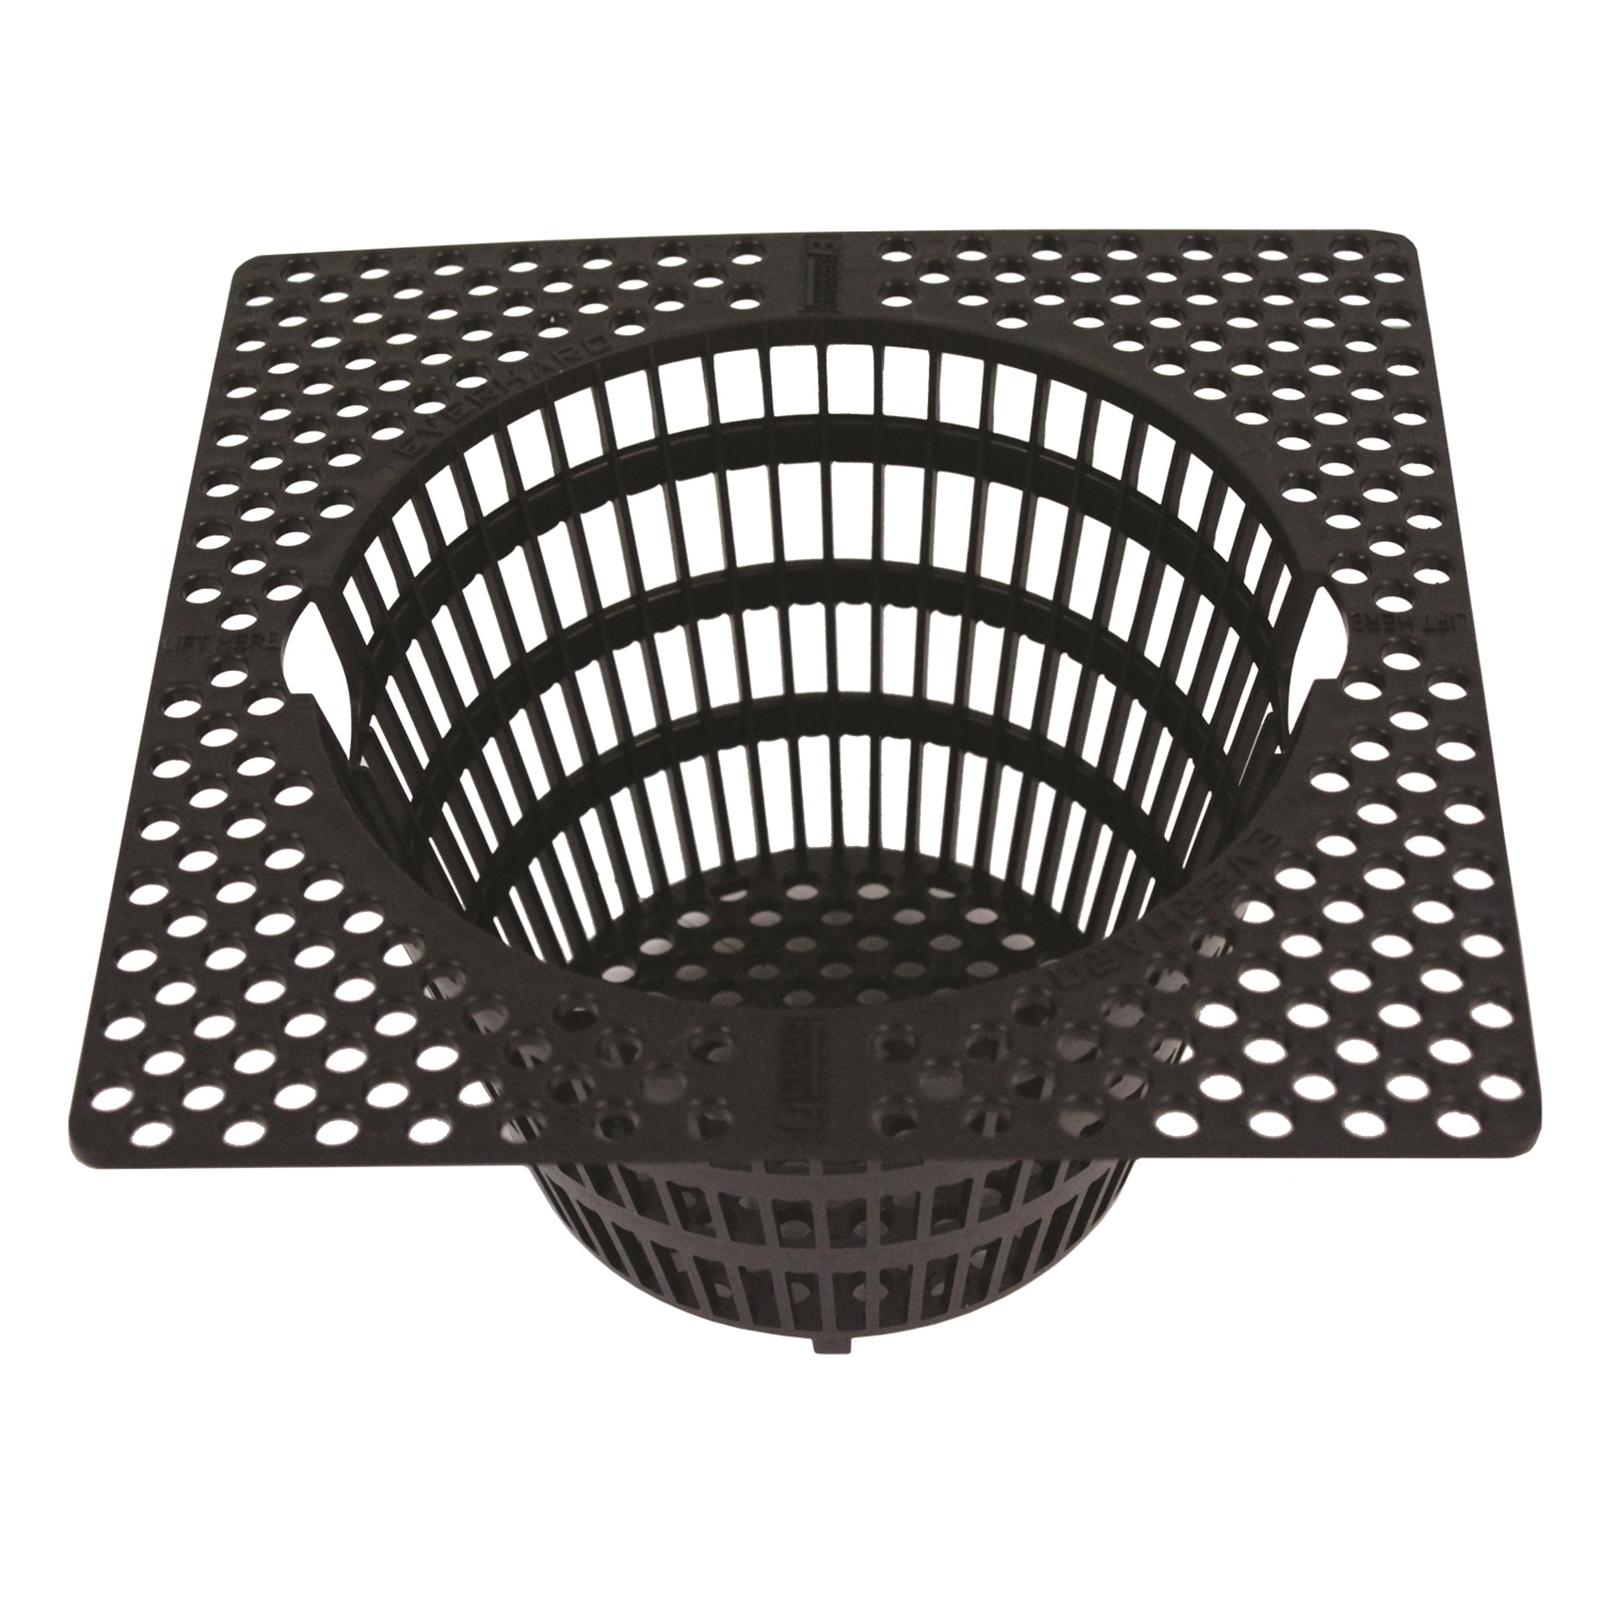 Everhard EasyDRAIN Leaf Basket to Suit Rainwater Pit